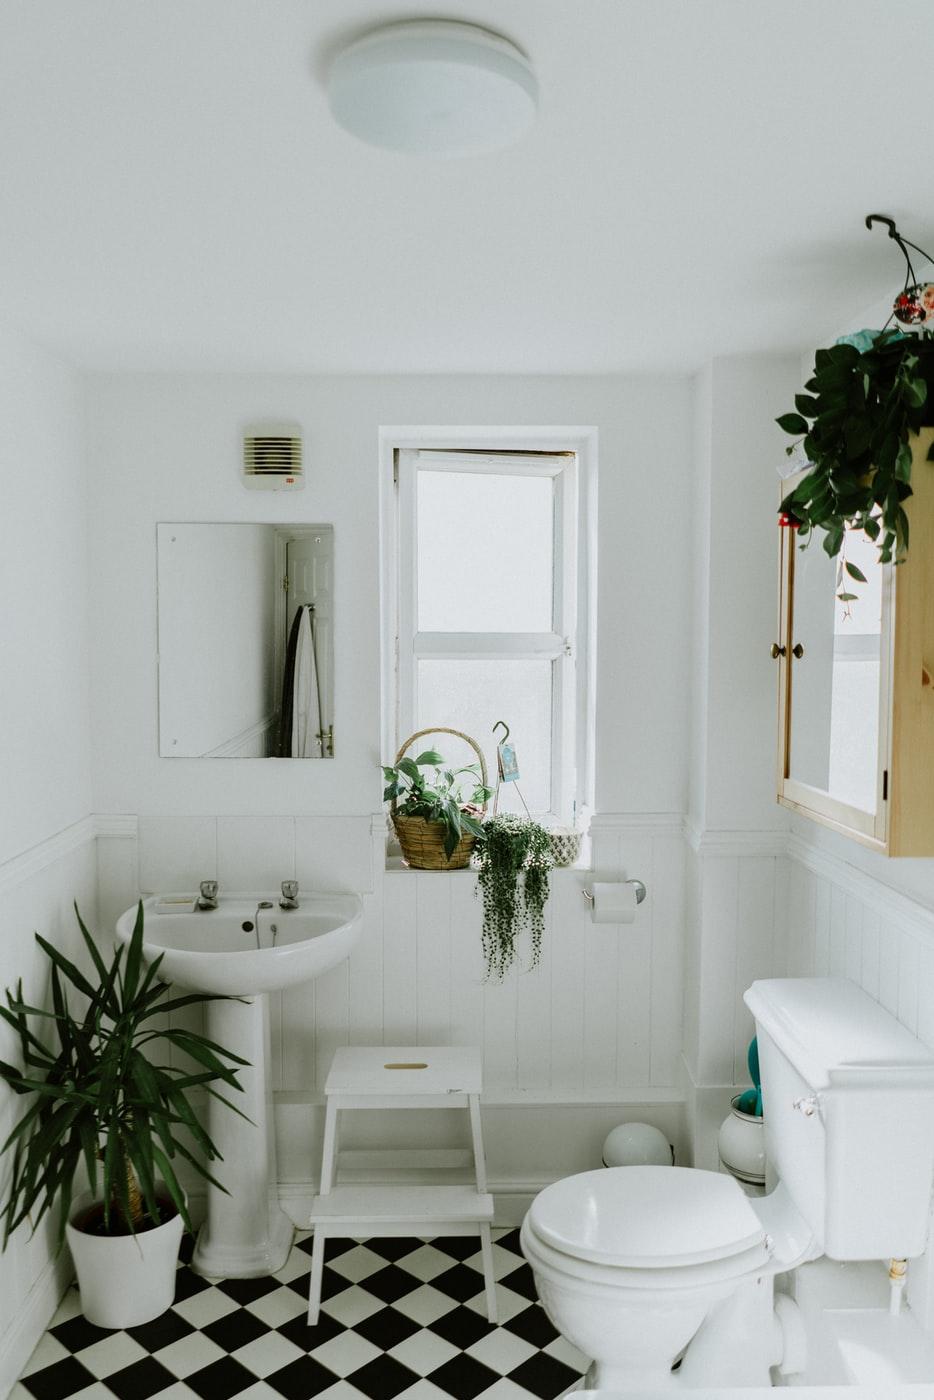 13 Best Bathroom Cleaners to Buy in 2020